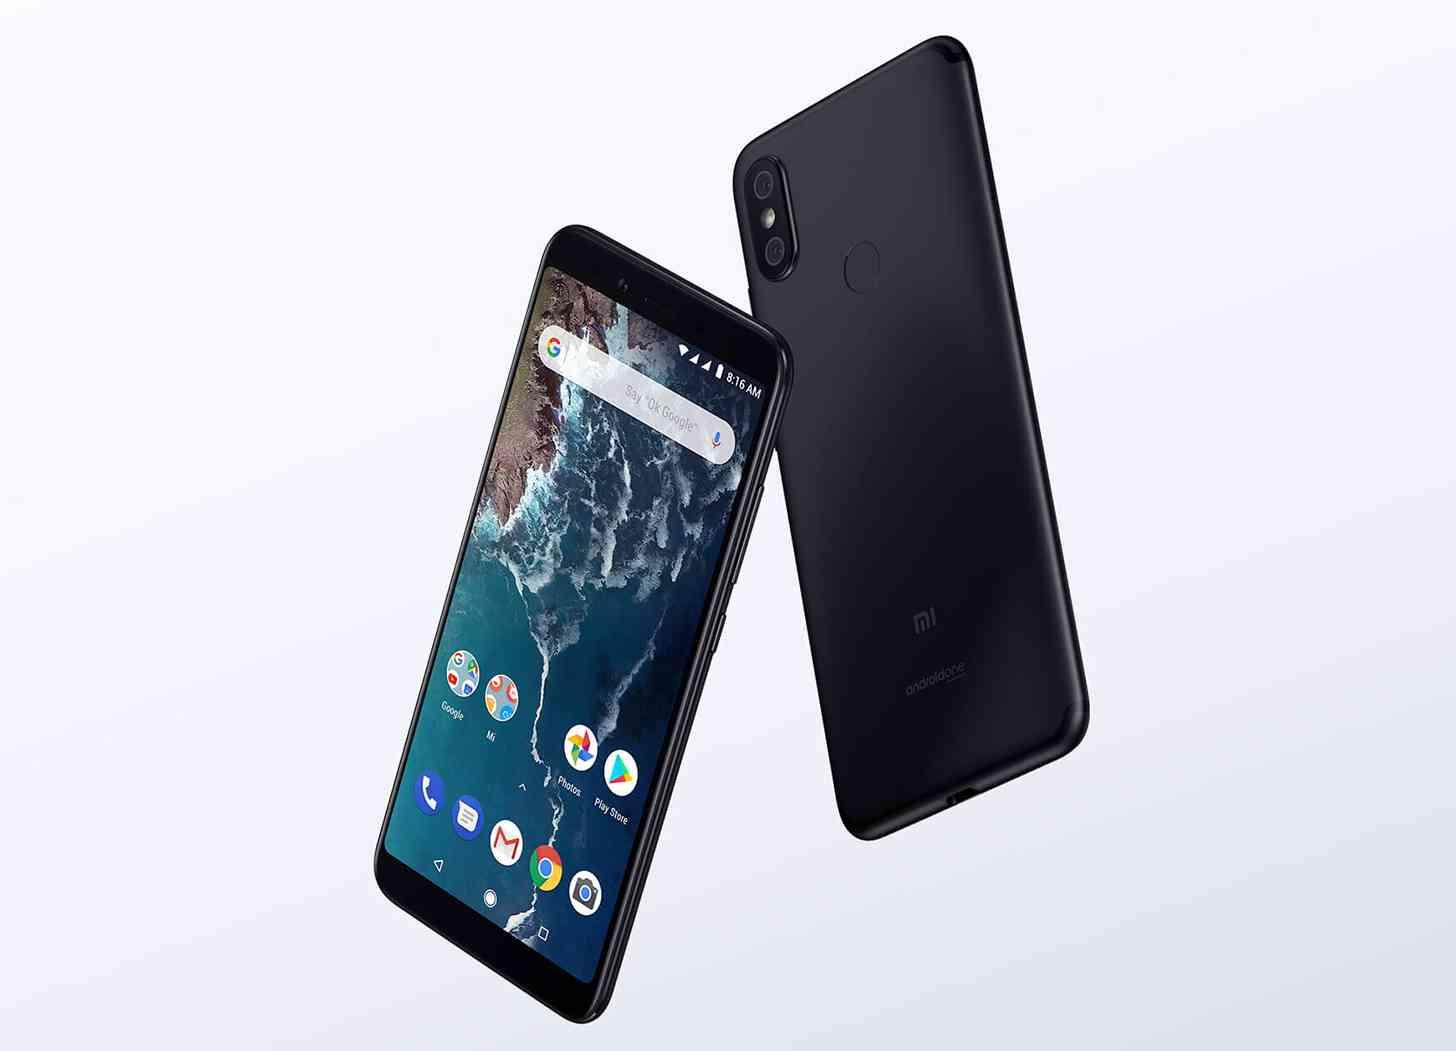 Googliercom Mexico Search Date 2018 07 25 Mainan 5d Ligths And Pop Music Bus Toys Civil War Bump N Go 368b 2 Xiaomi Mi A2 Android One Official